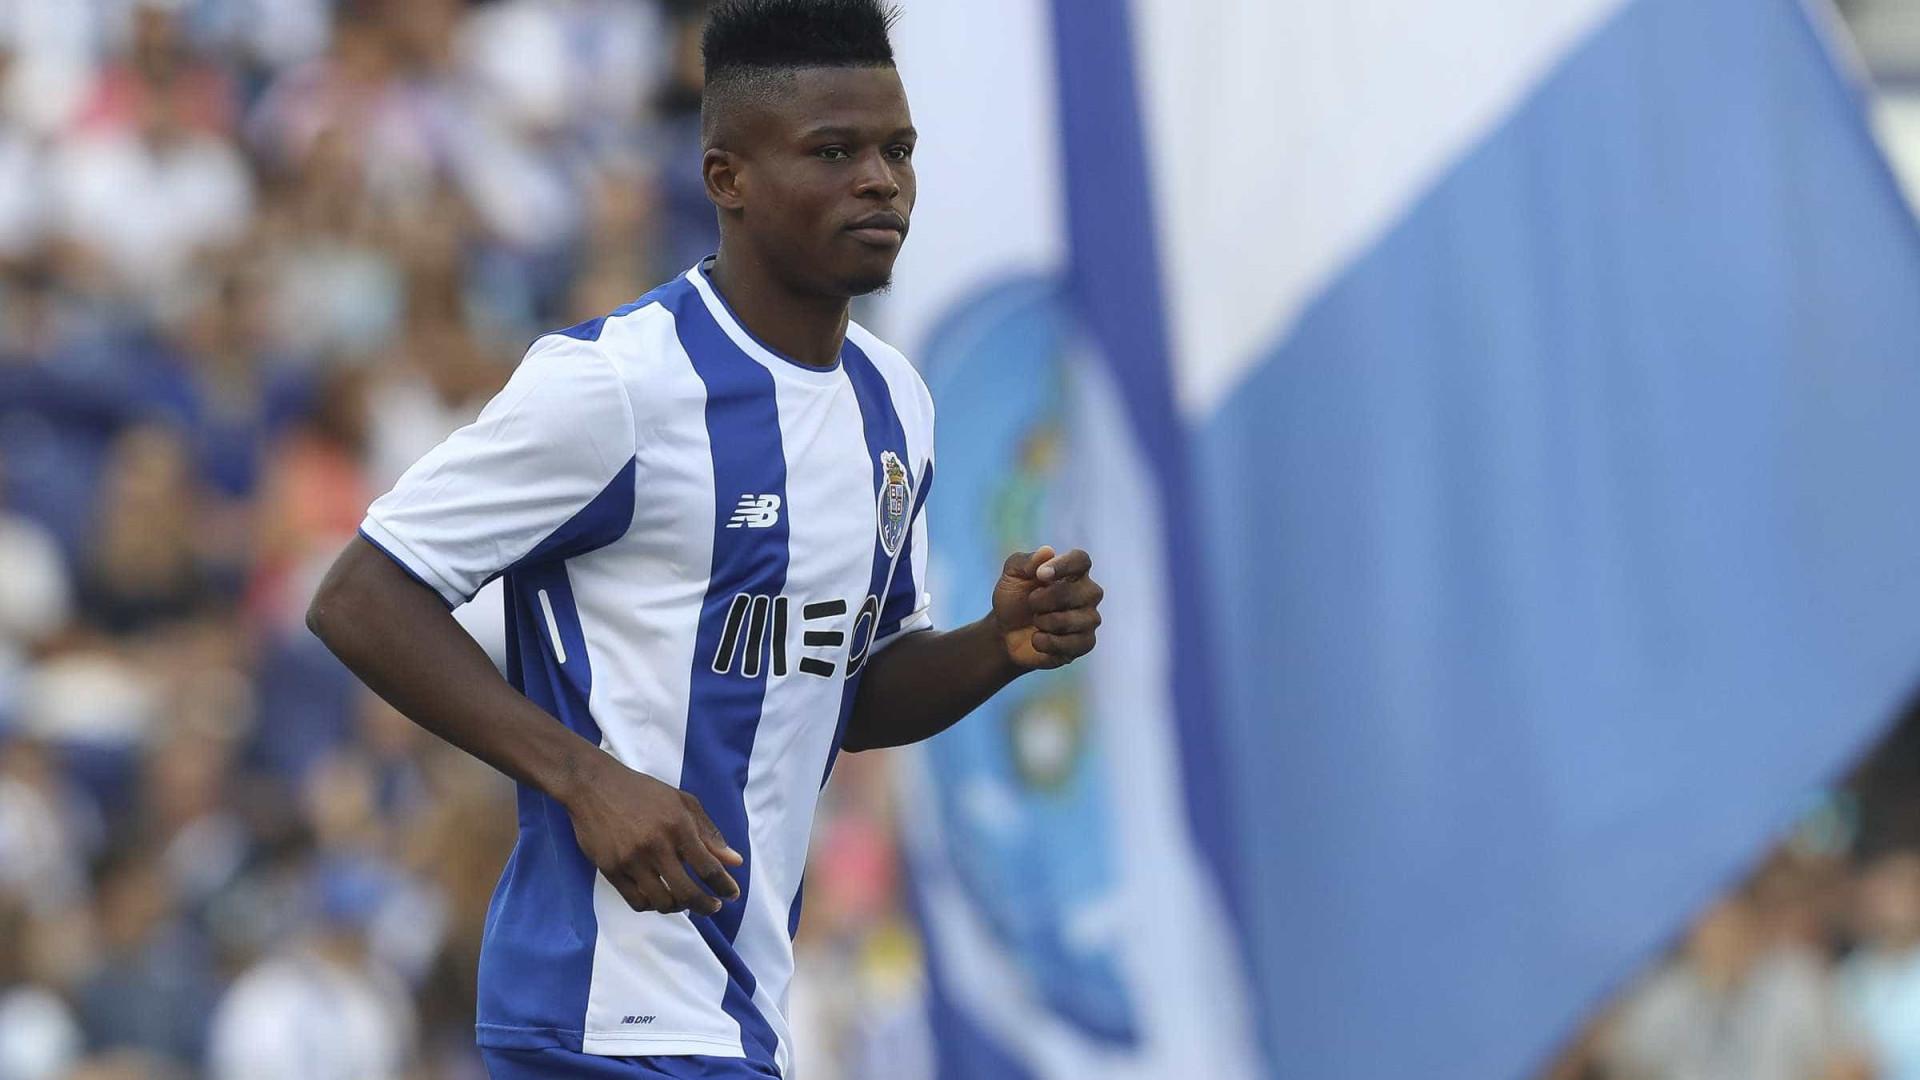 Bursaspor anuncia Mikel Agu por empréstimo do FC Porto